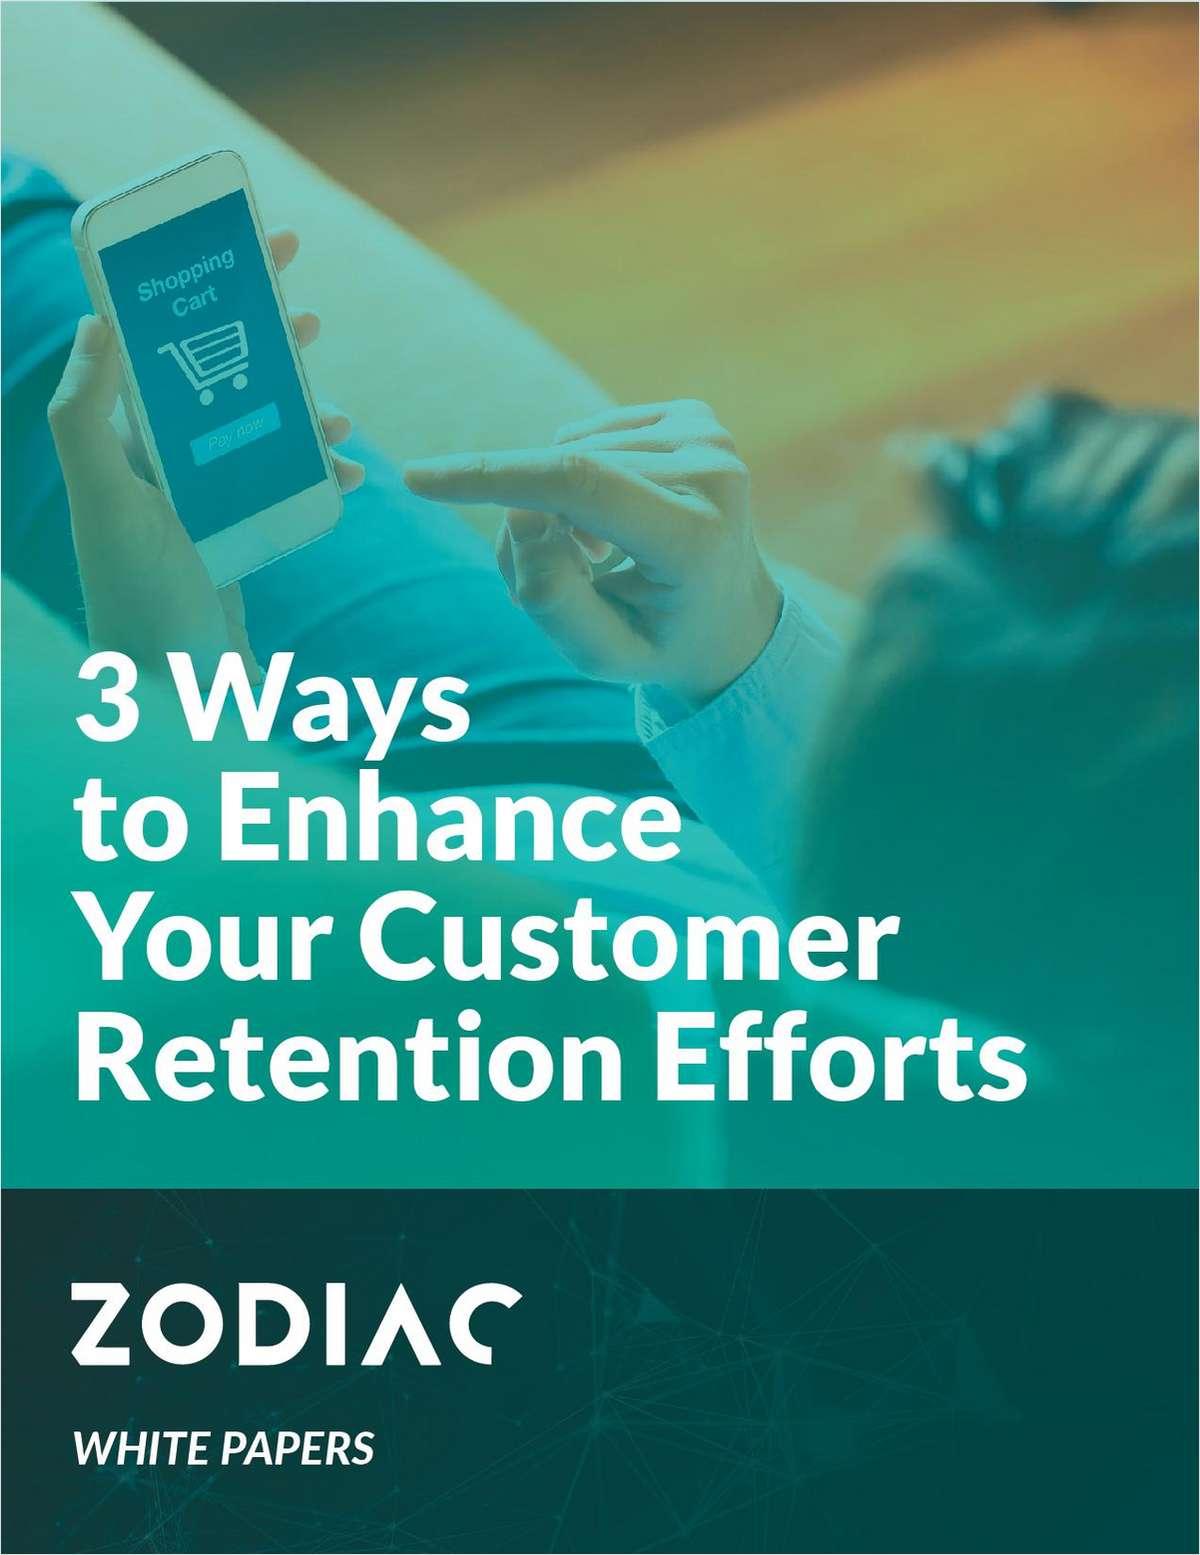 Three Ways to Enhance Your Customer Retention Efforts